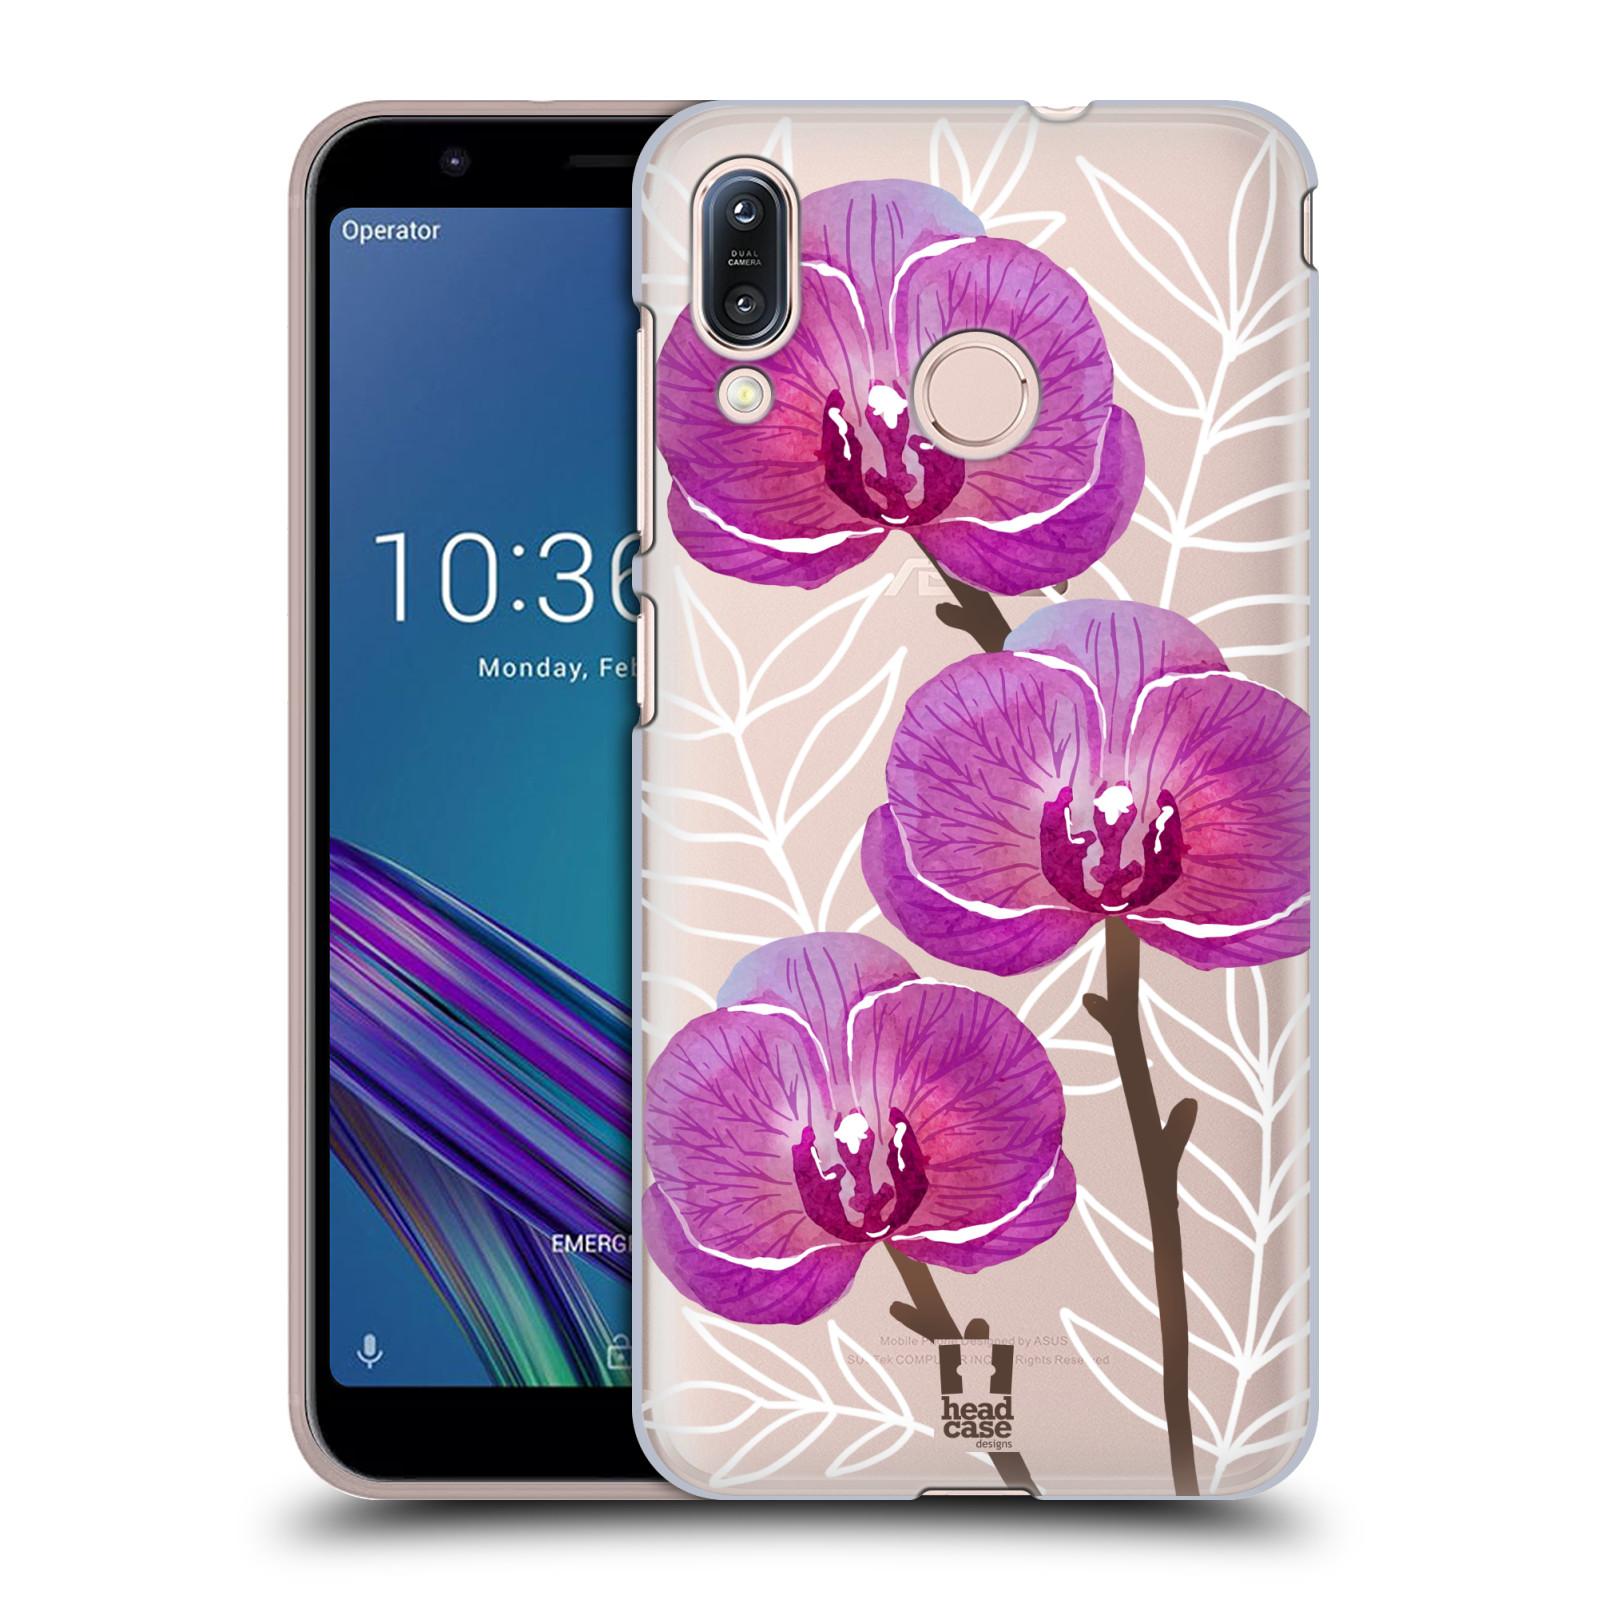 Pouzdro na mobil Asus Zenfone Max M1 (ZB555KL) - HEAD CASE - Orchideje fialová